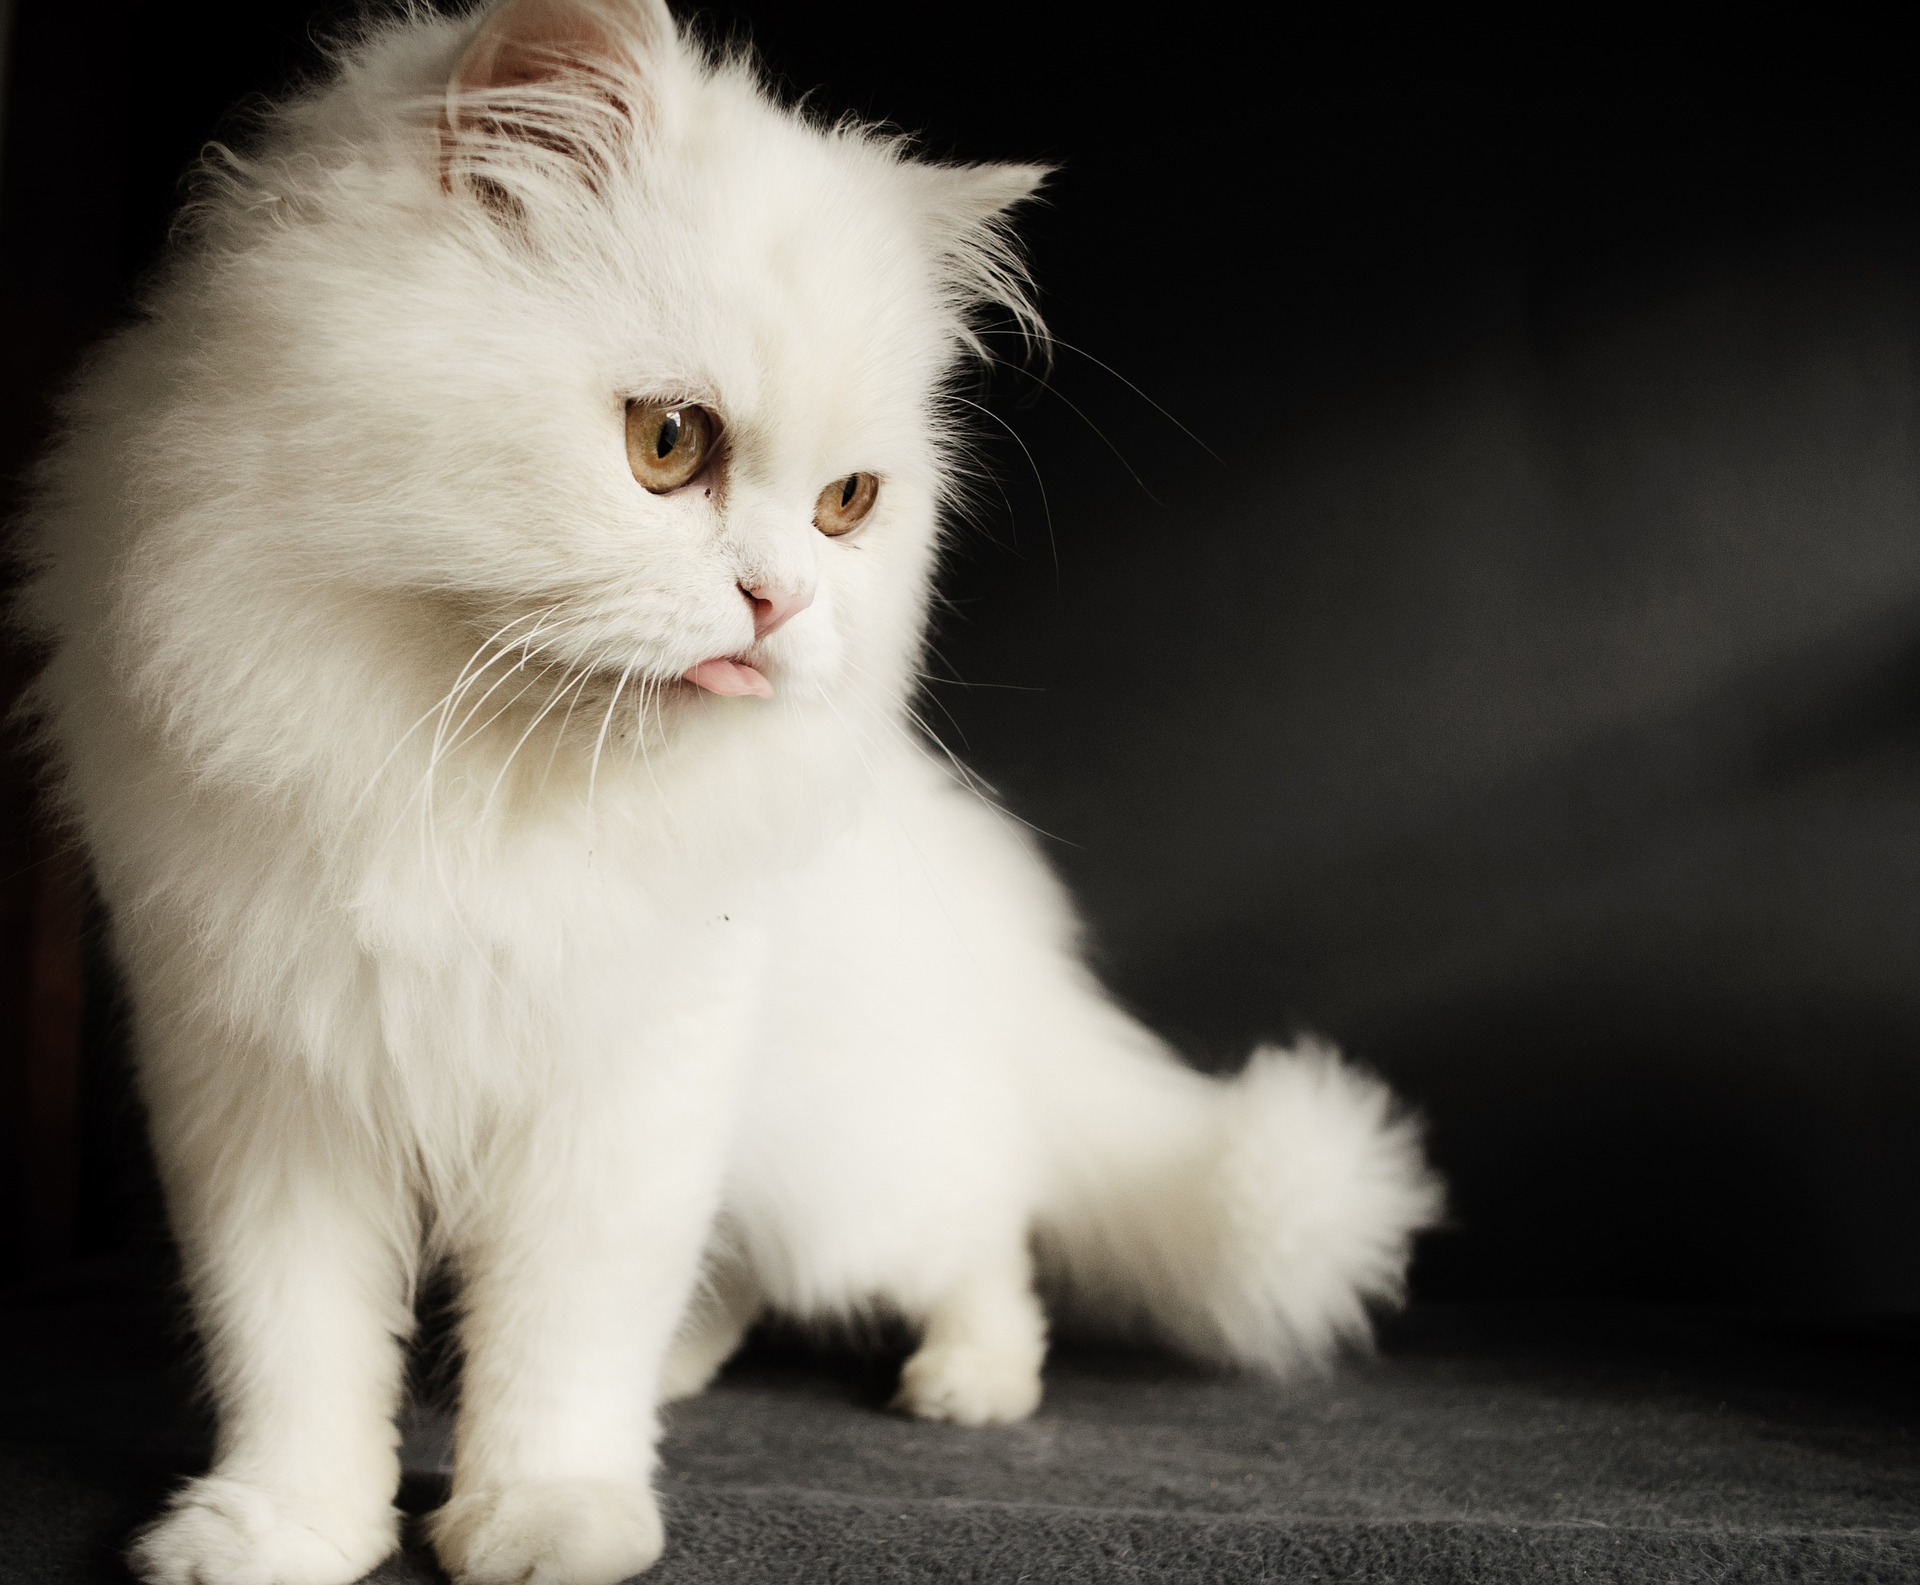 Gatito Persa Blanco Lindo